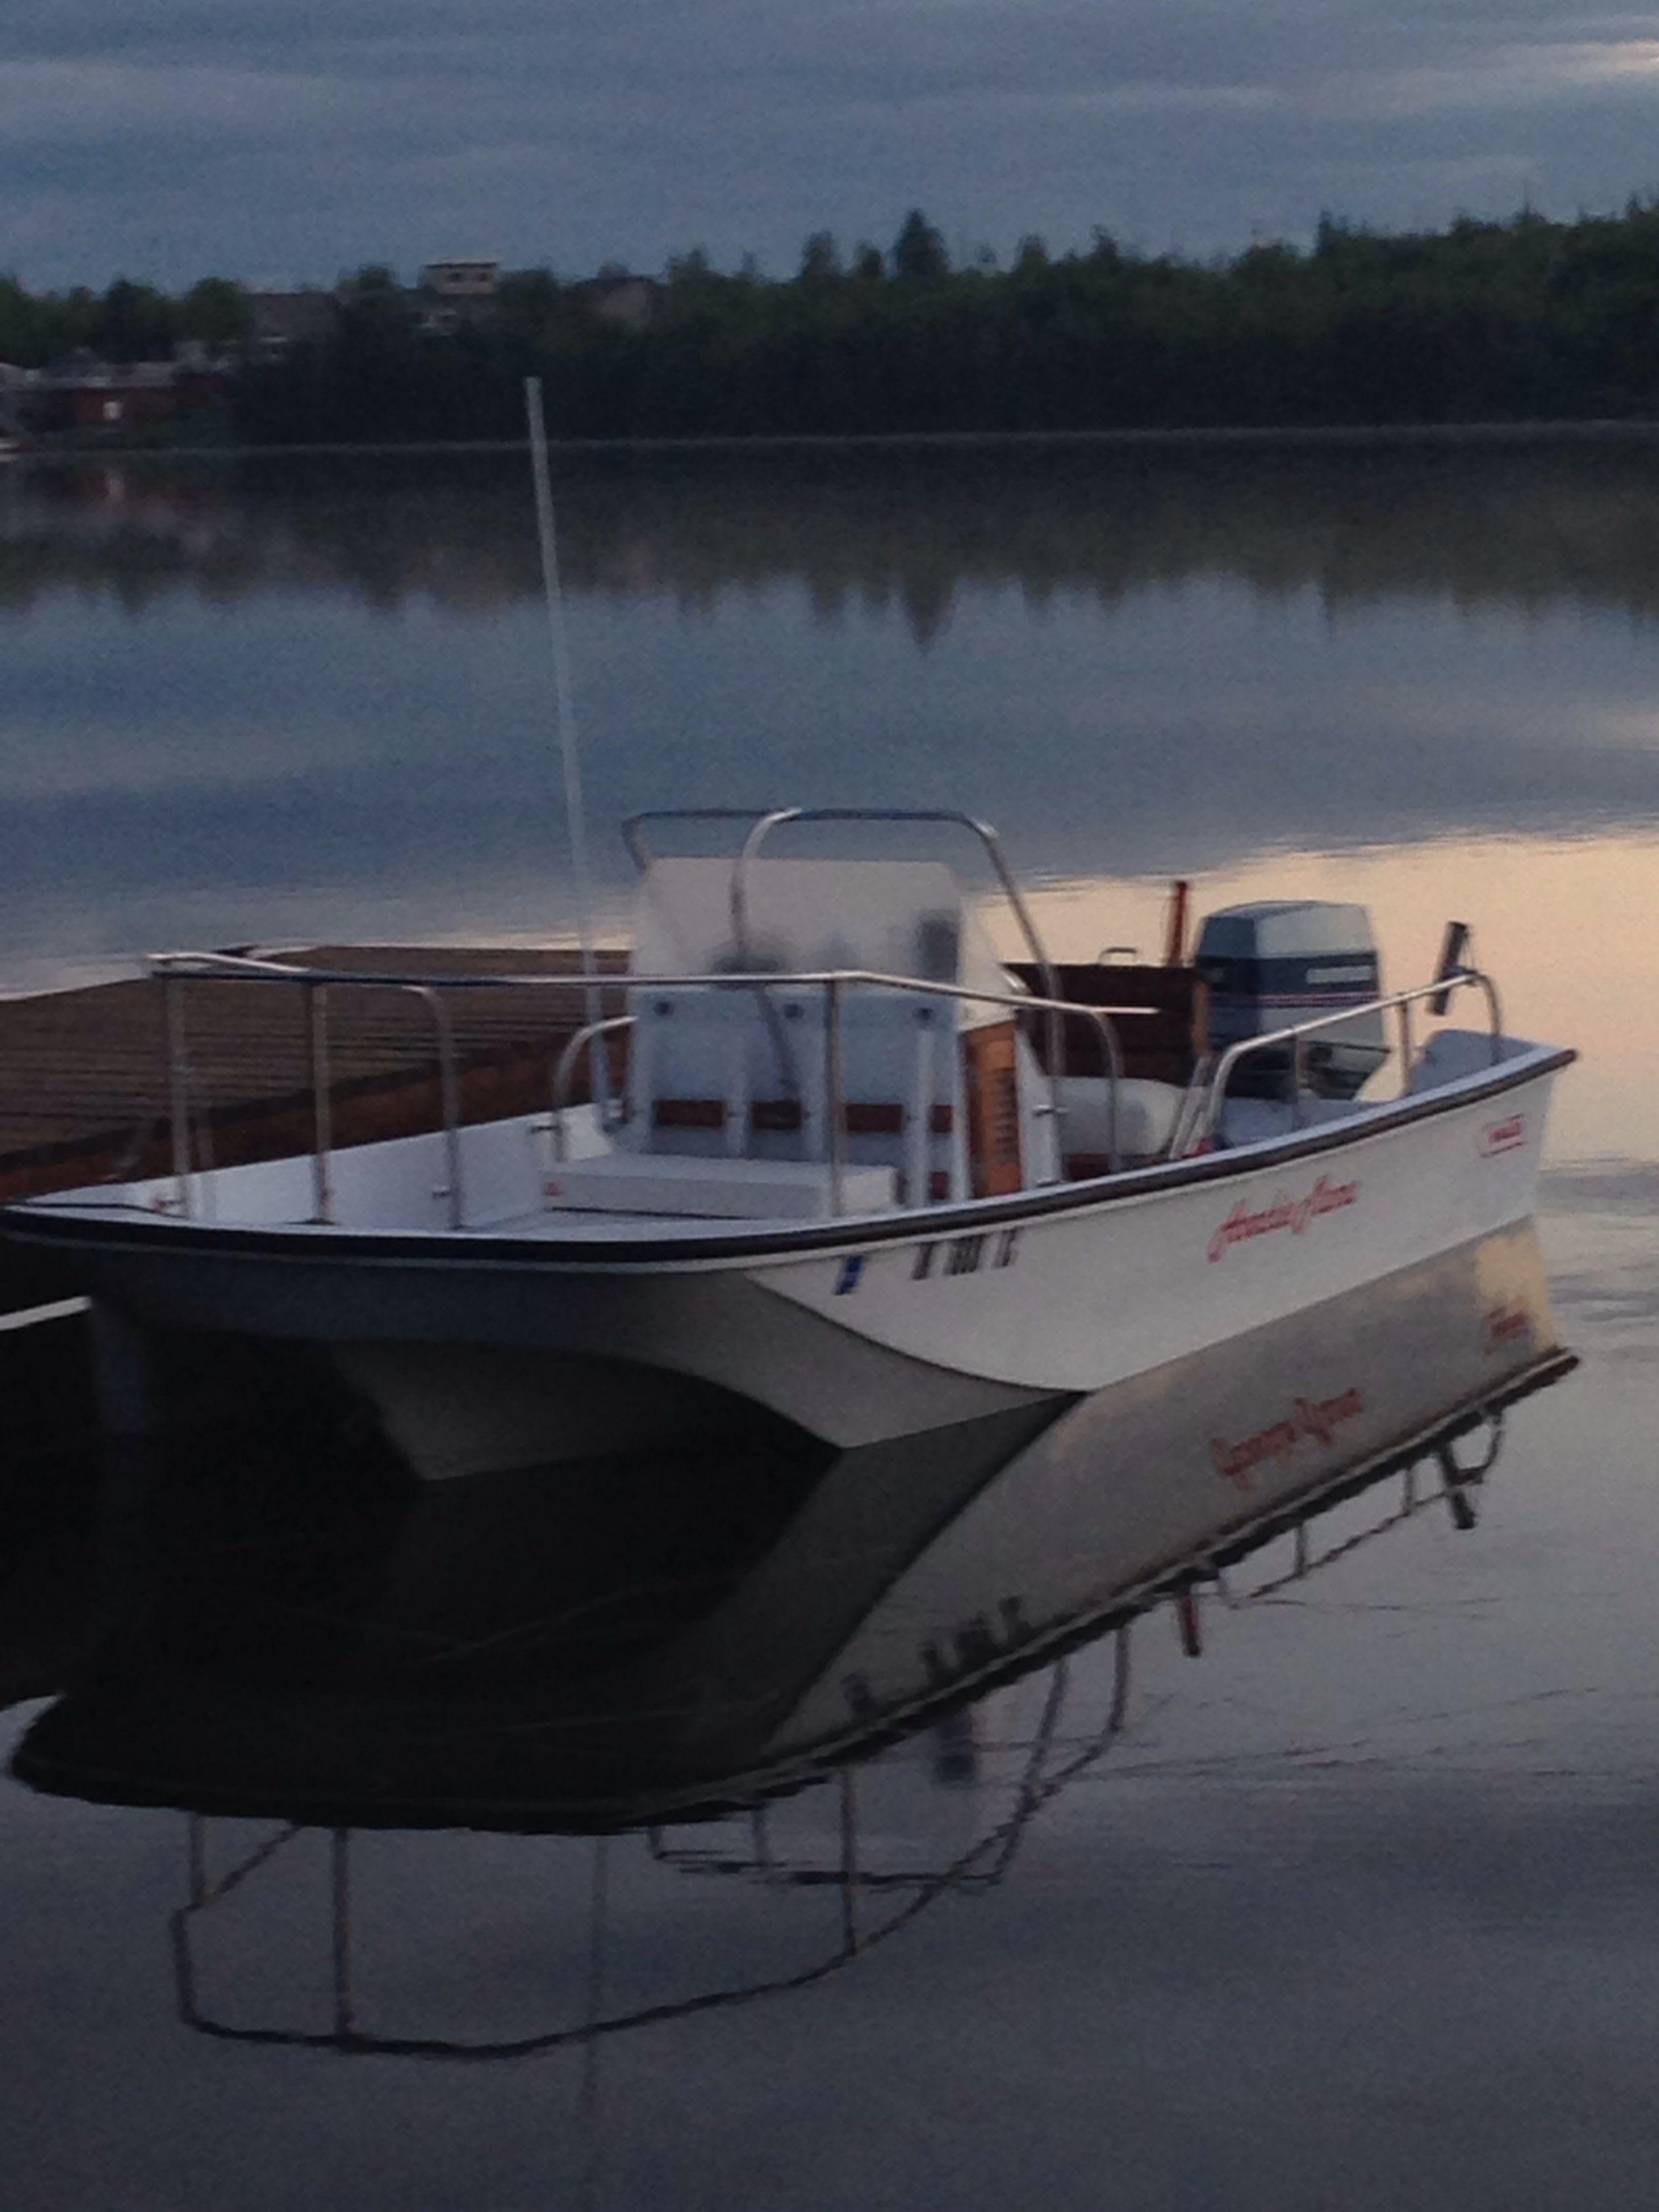 Restored Our 1980 Boston Whaler Montauk Boston Whaler Boston Whaler Boats Whalers